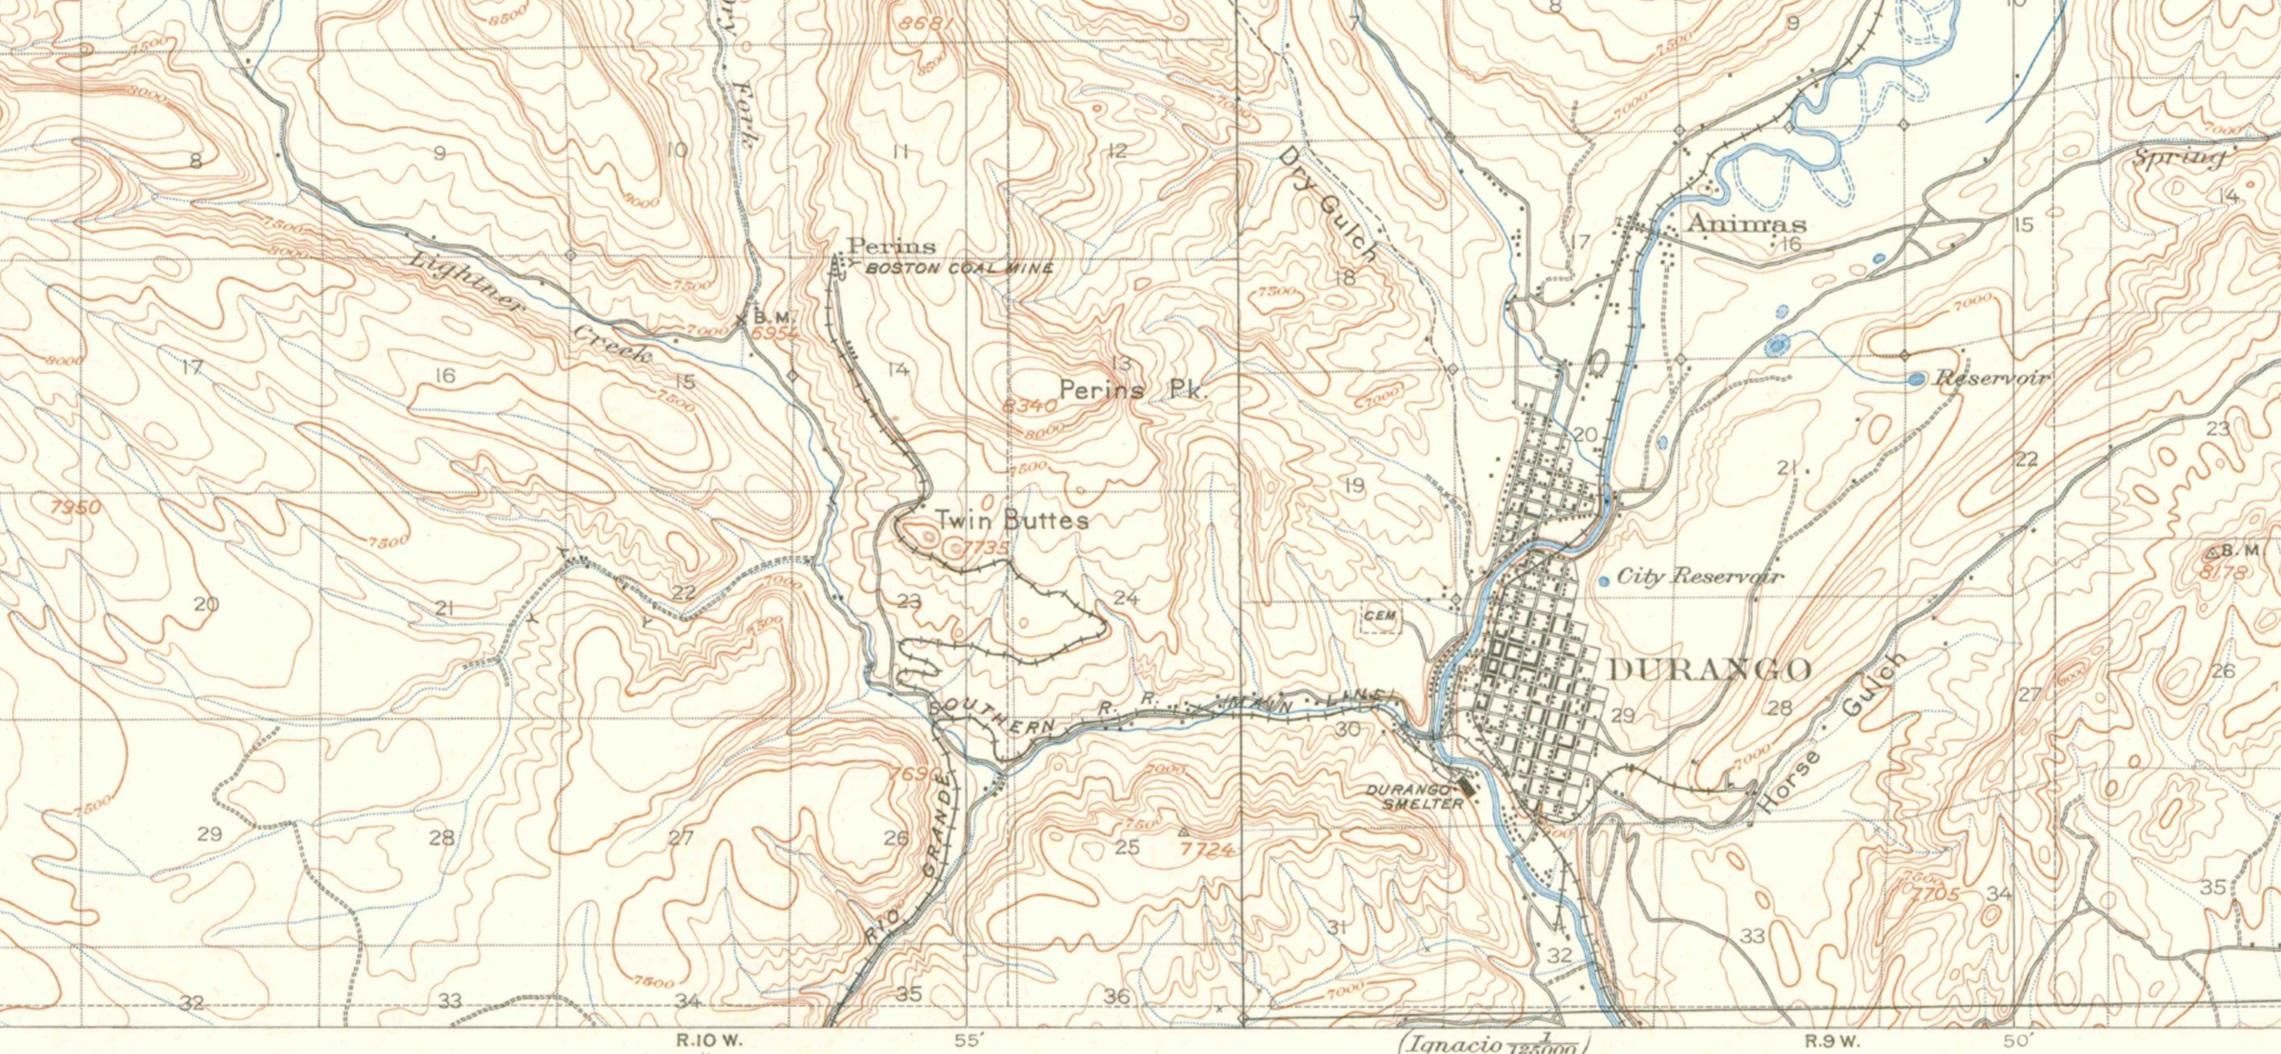 Durango History Via Topo Maps